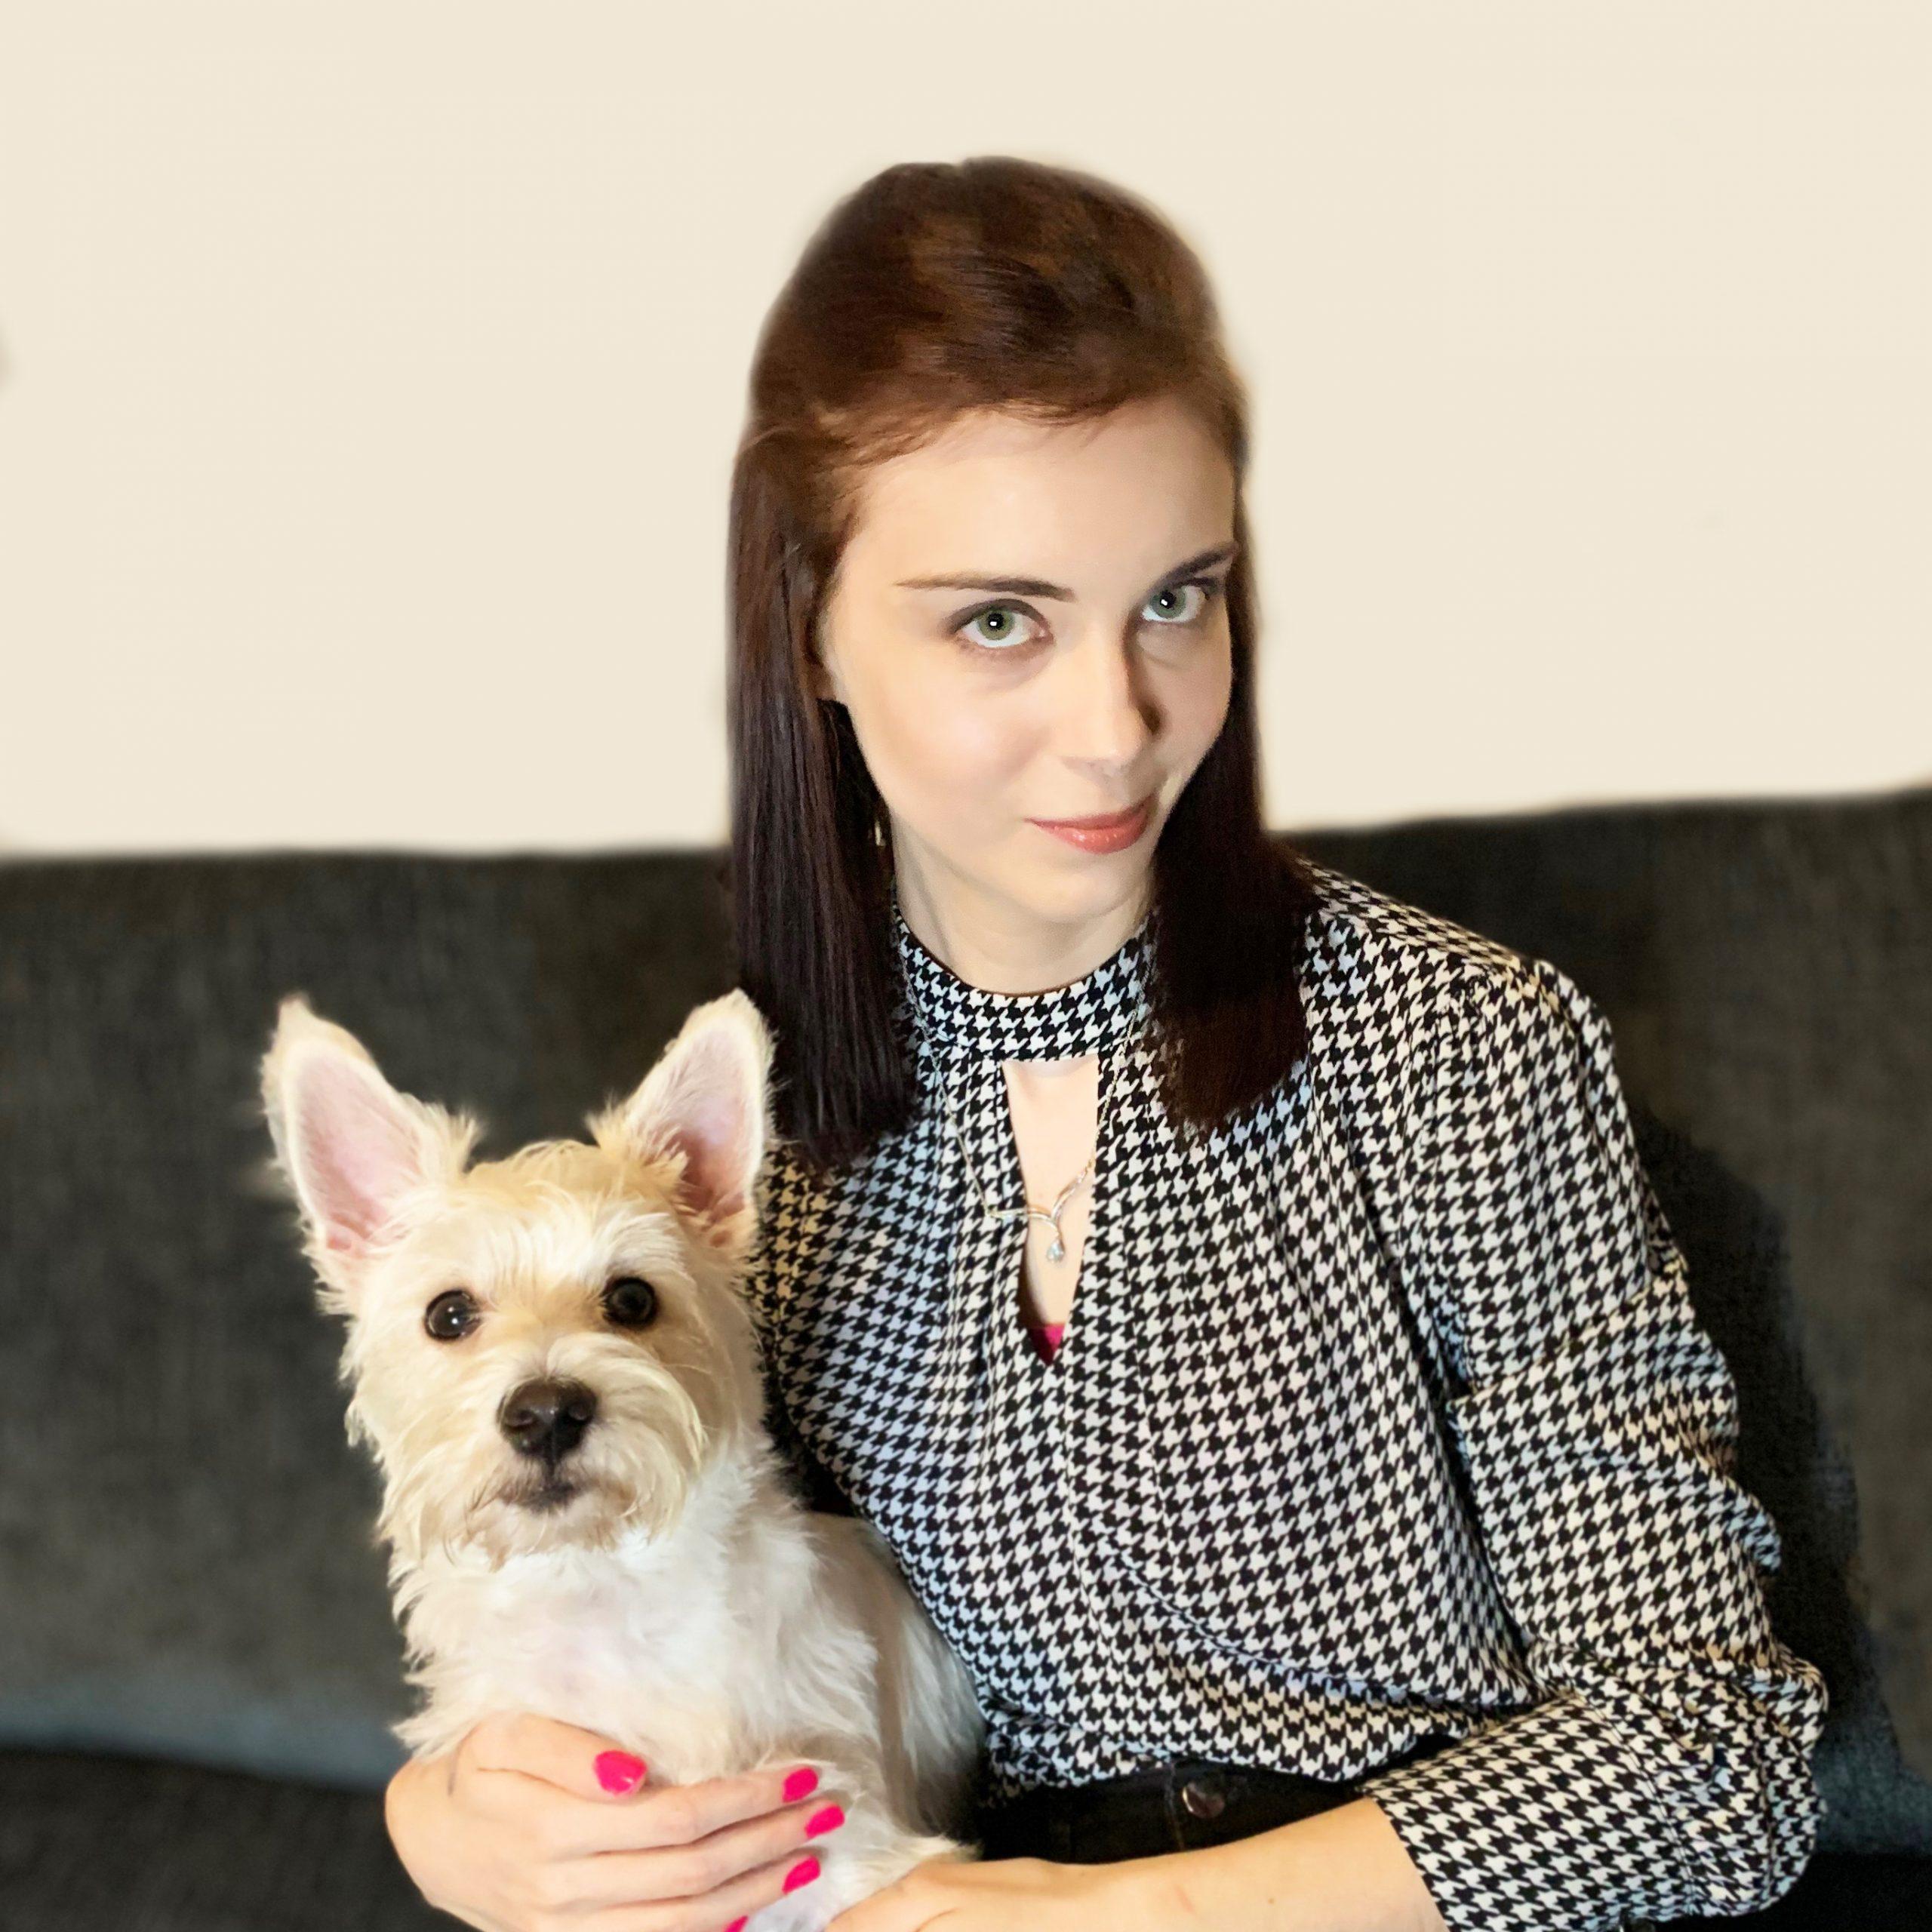 Kristina Adams and her dog, Millie